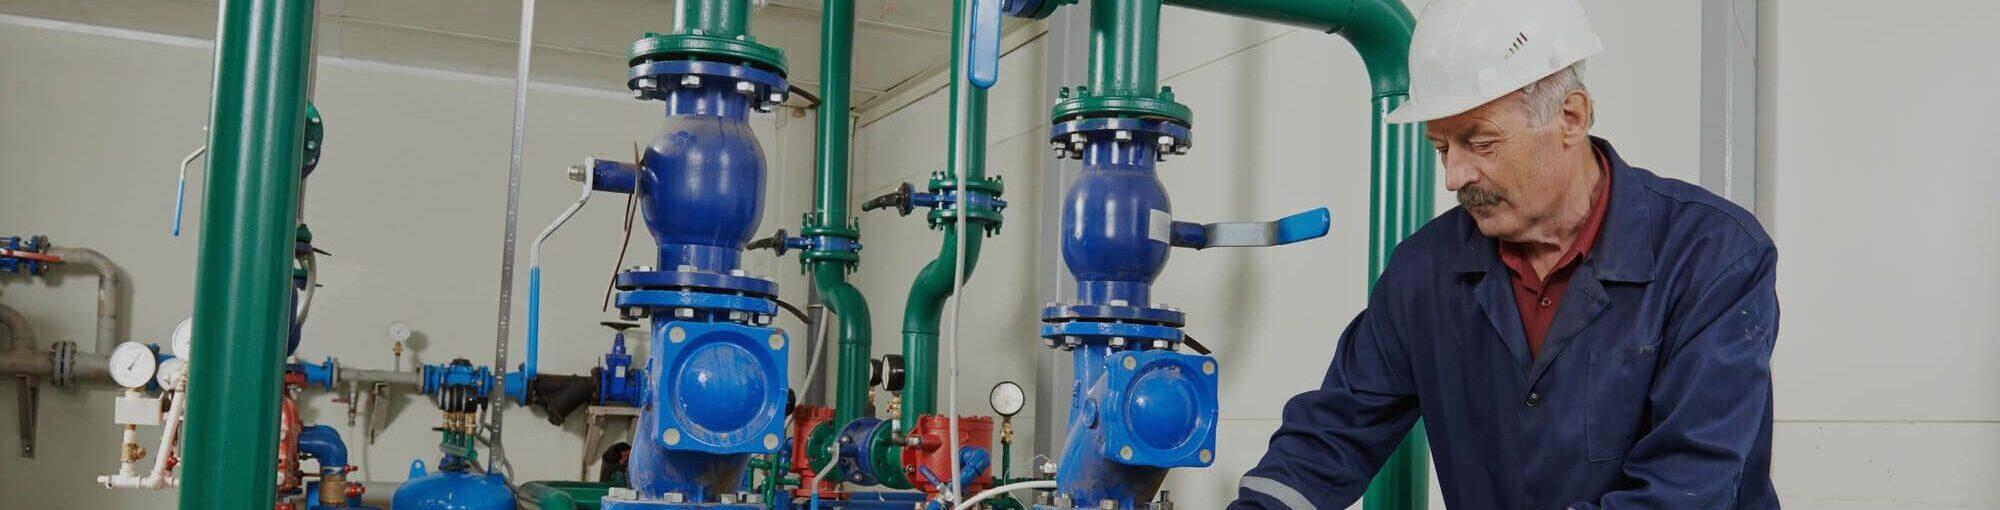 How Honeywell Burner Valves Are Helping the Environment